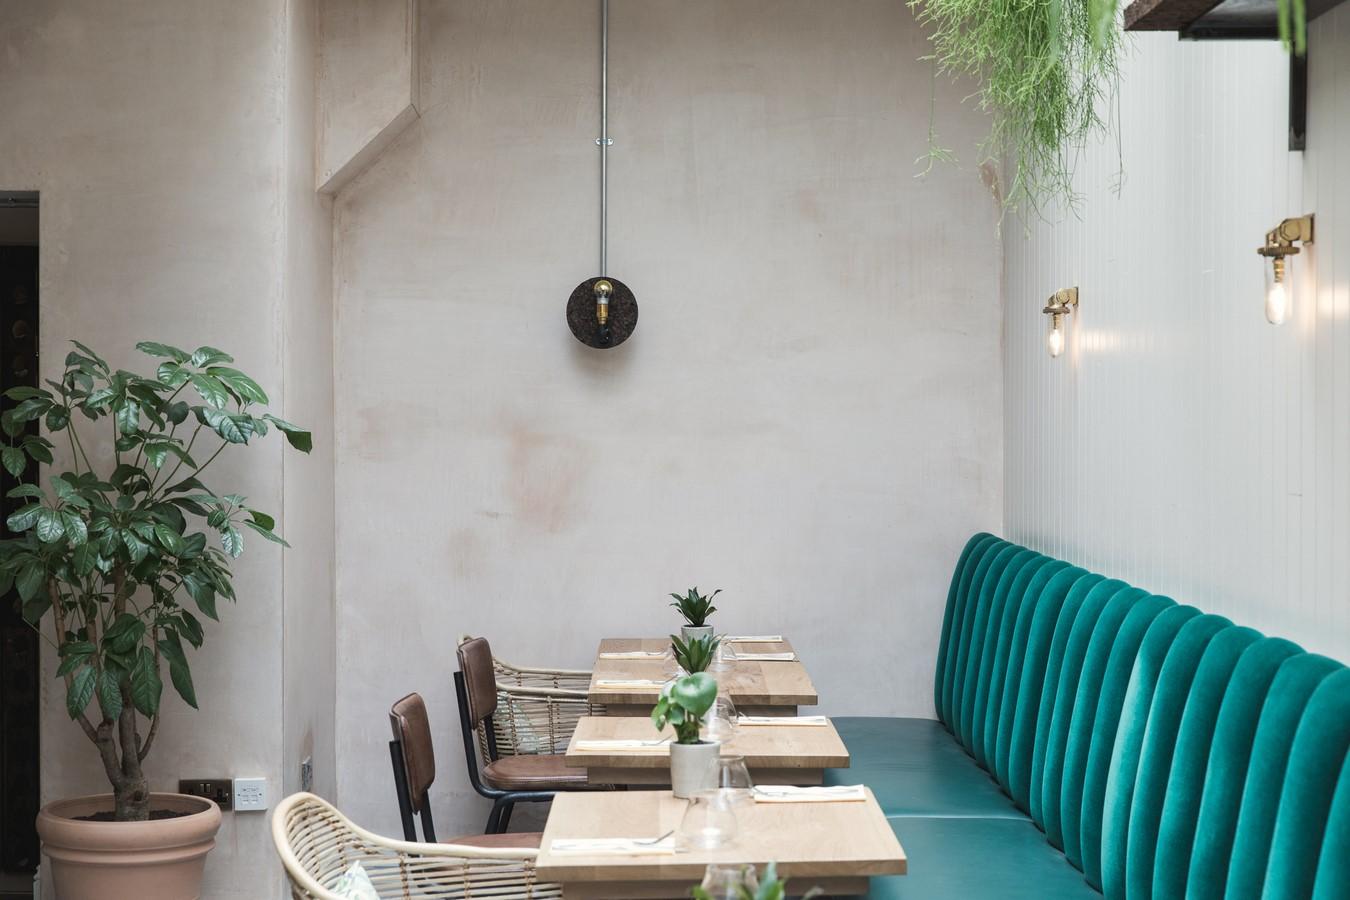 Humble Grape Wine Bar + Shop + Kitchen by Trellik Design Studio - Sheet3